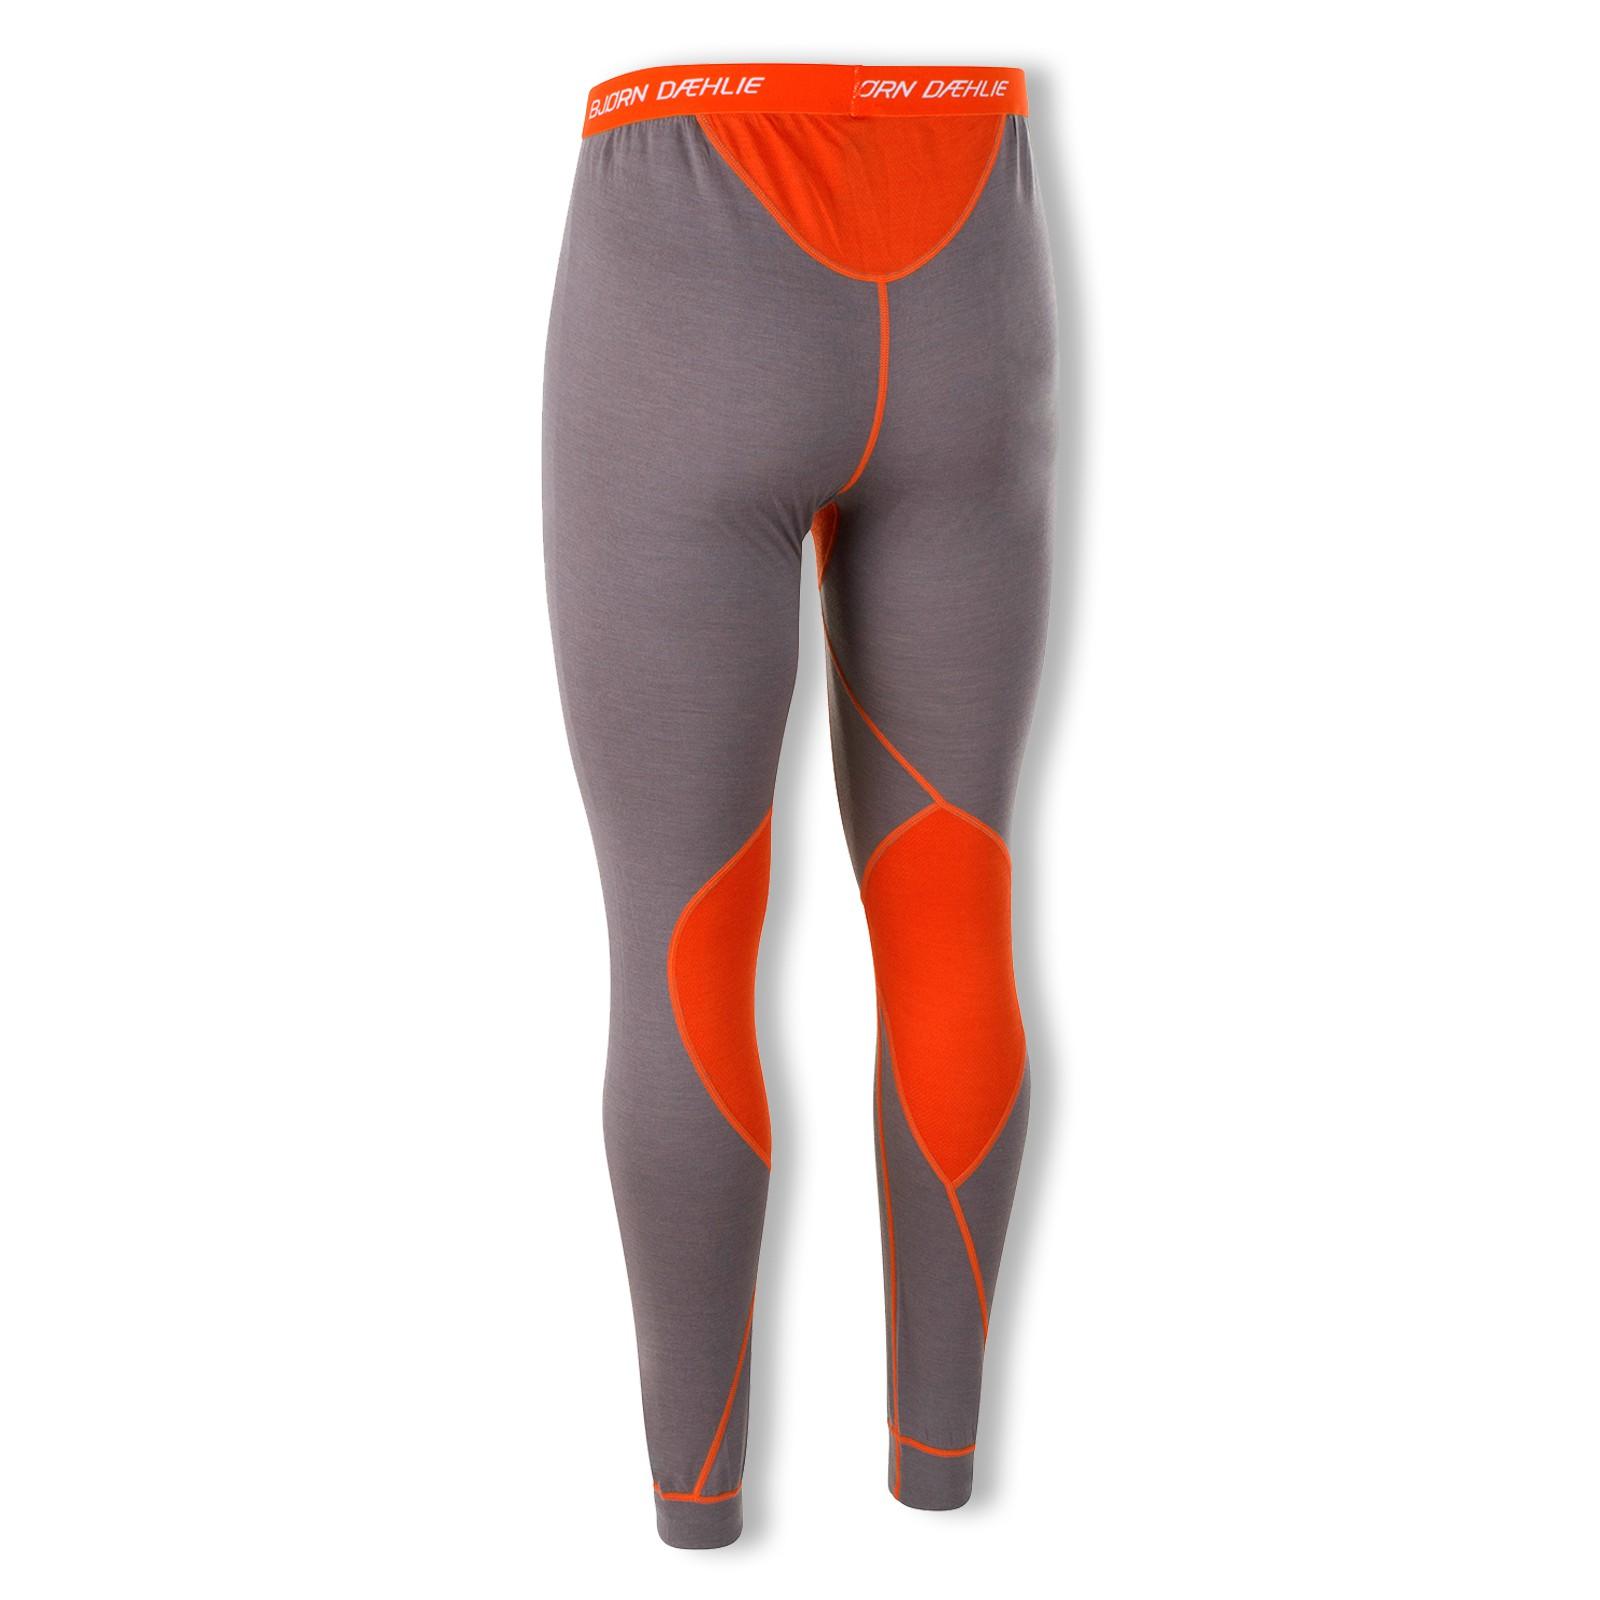 Björn Daehlie Herren Unterhose Skiunterhose Baselayer Pants Warm 320943 M L XL in shark/tangerine tango